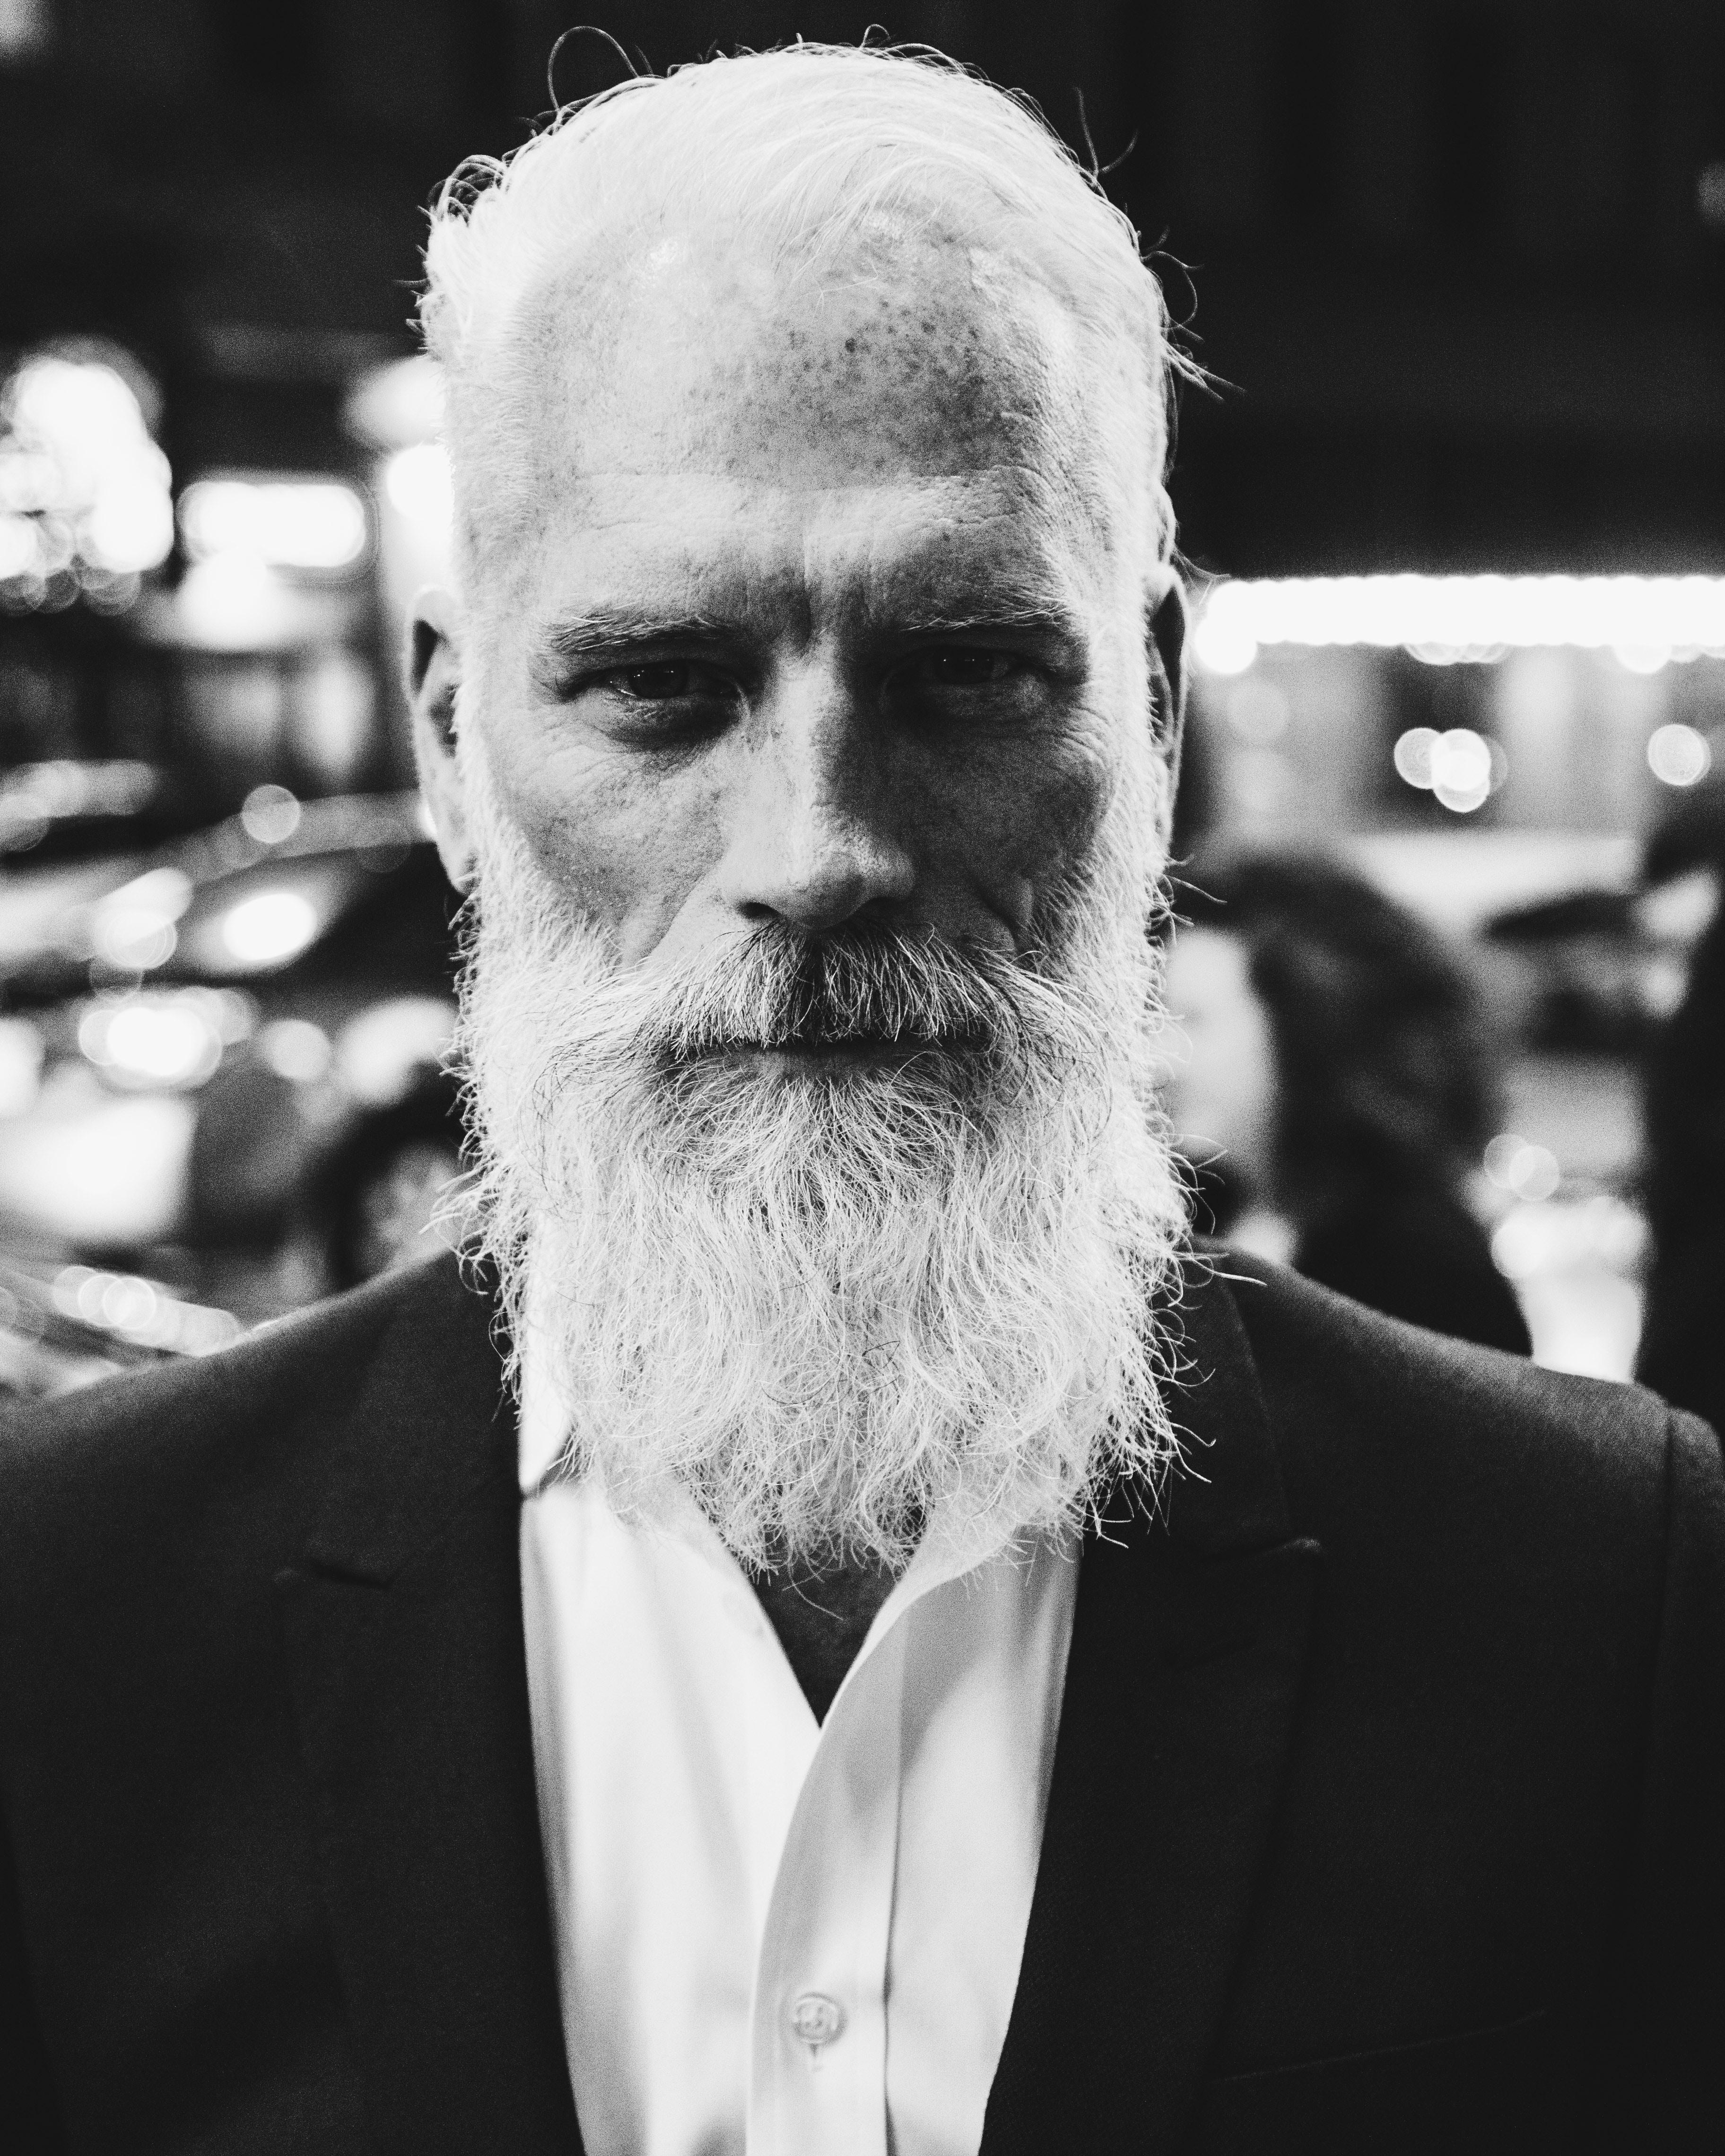 grayscale photo of bearded man